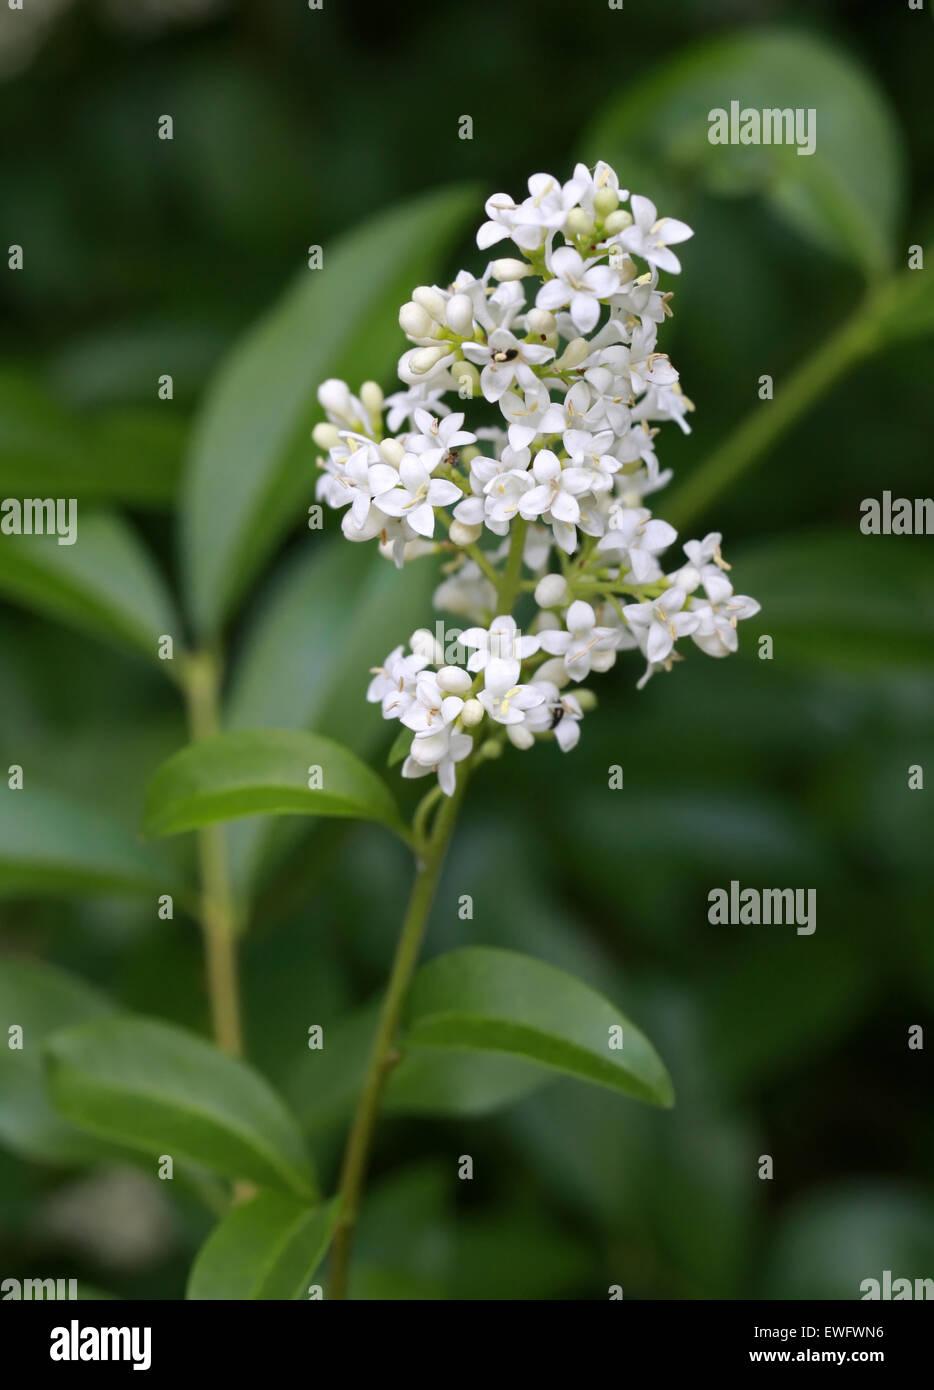 Common Privet or European Privet, Ligustrum vulgare, Oleaceae. Stock Photo